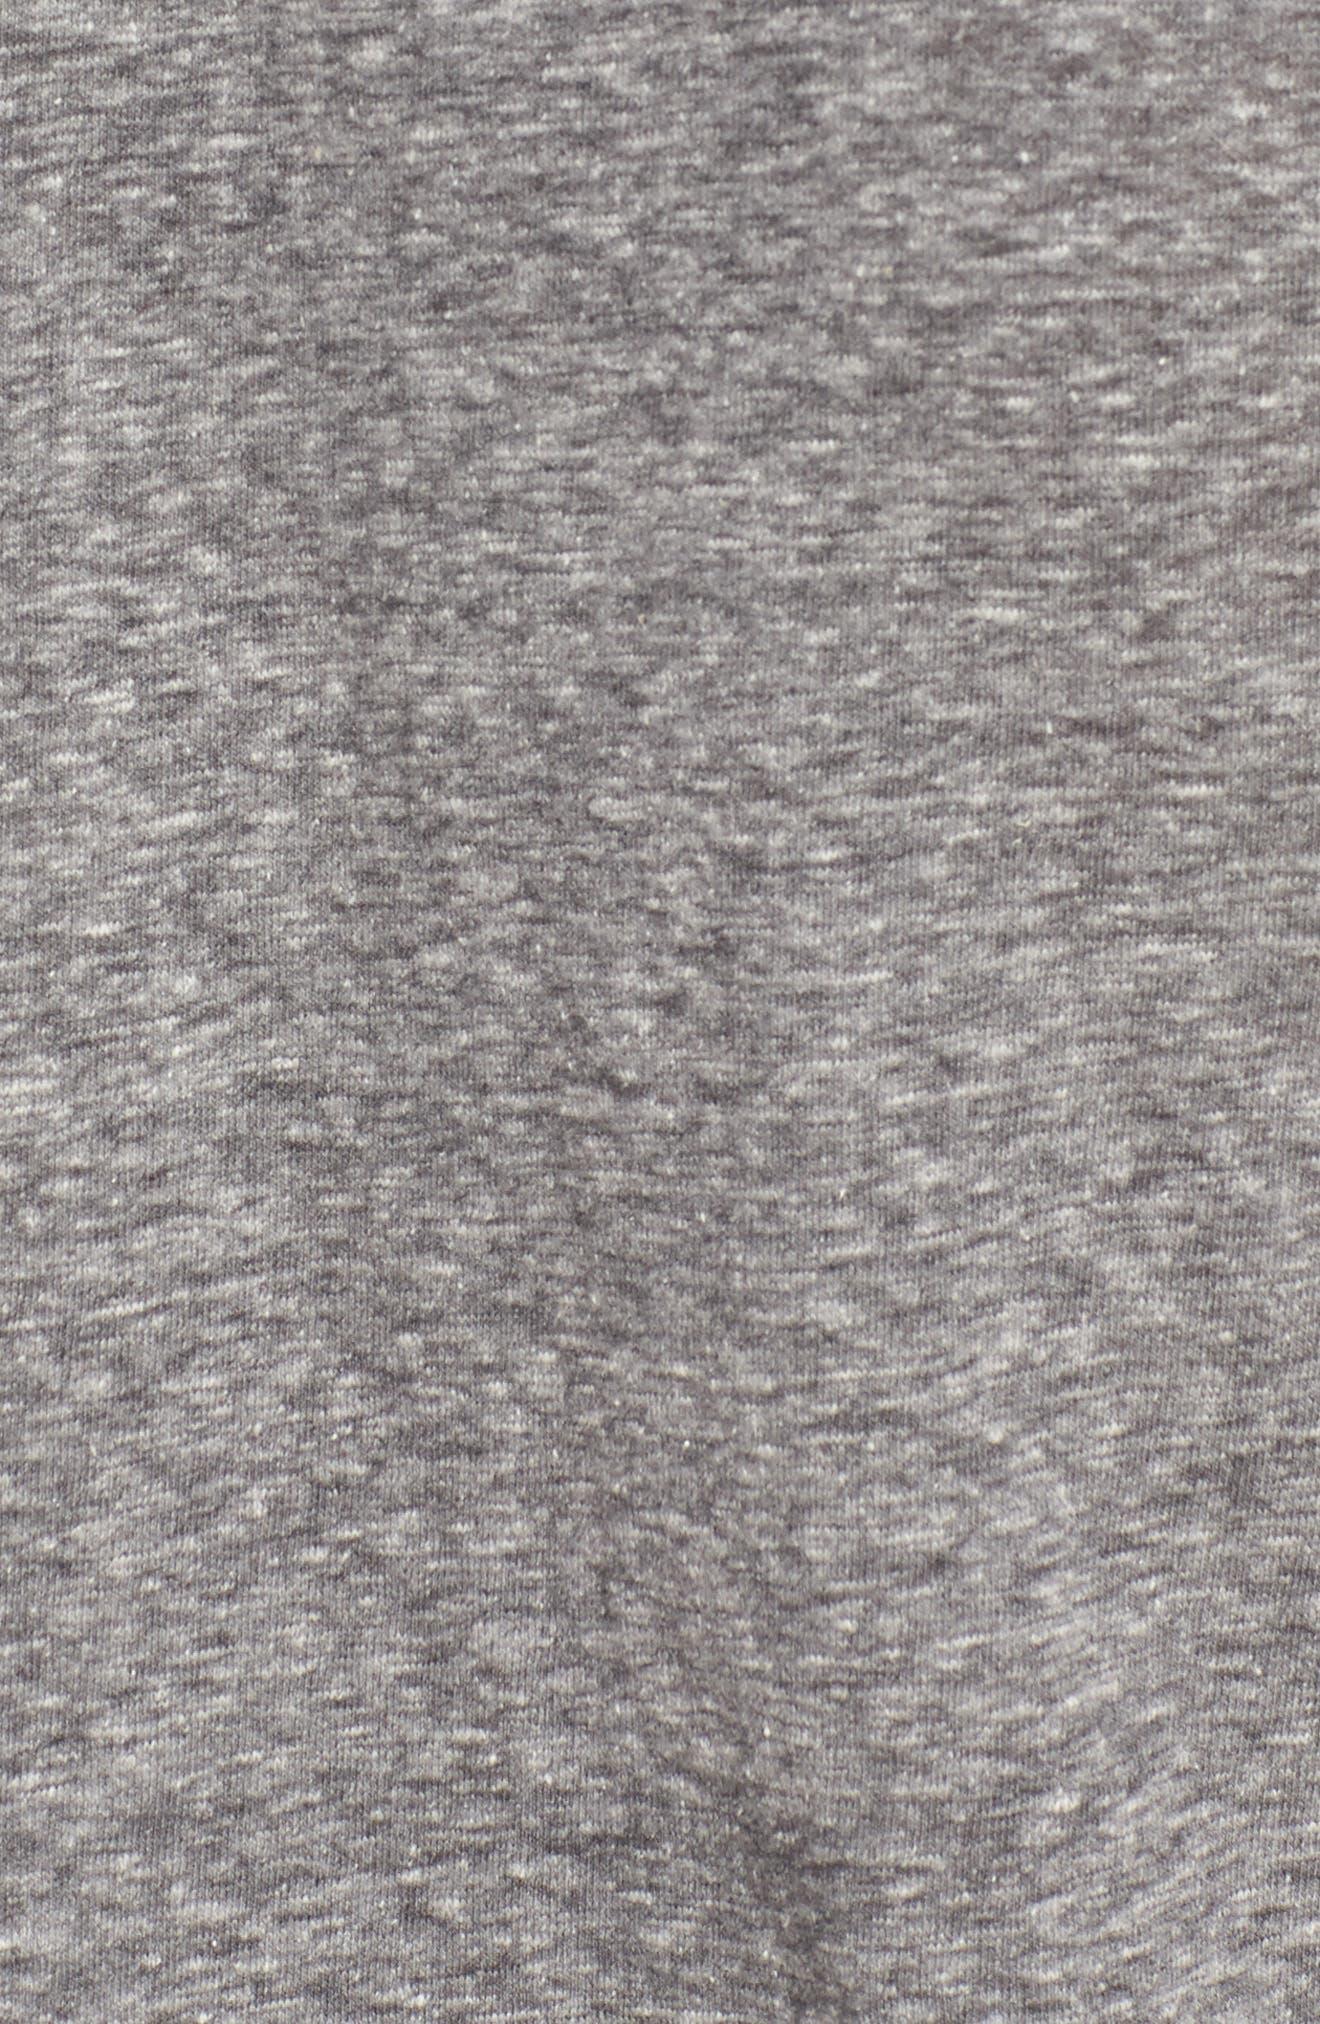 Bodysuit Tee,                             Alternate thumbnail 5, color,                             022